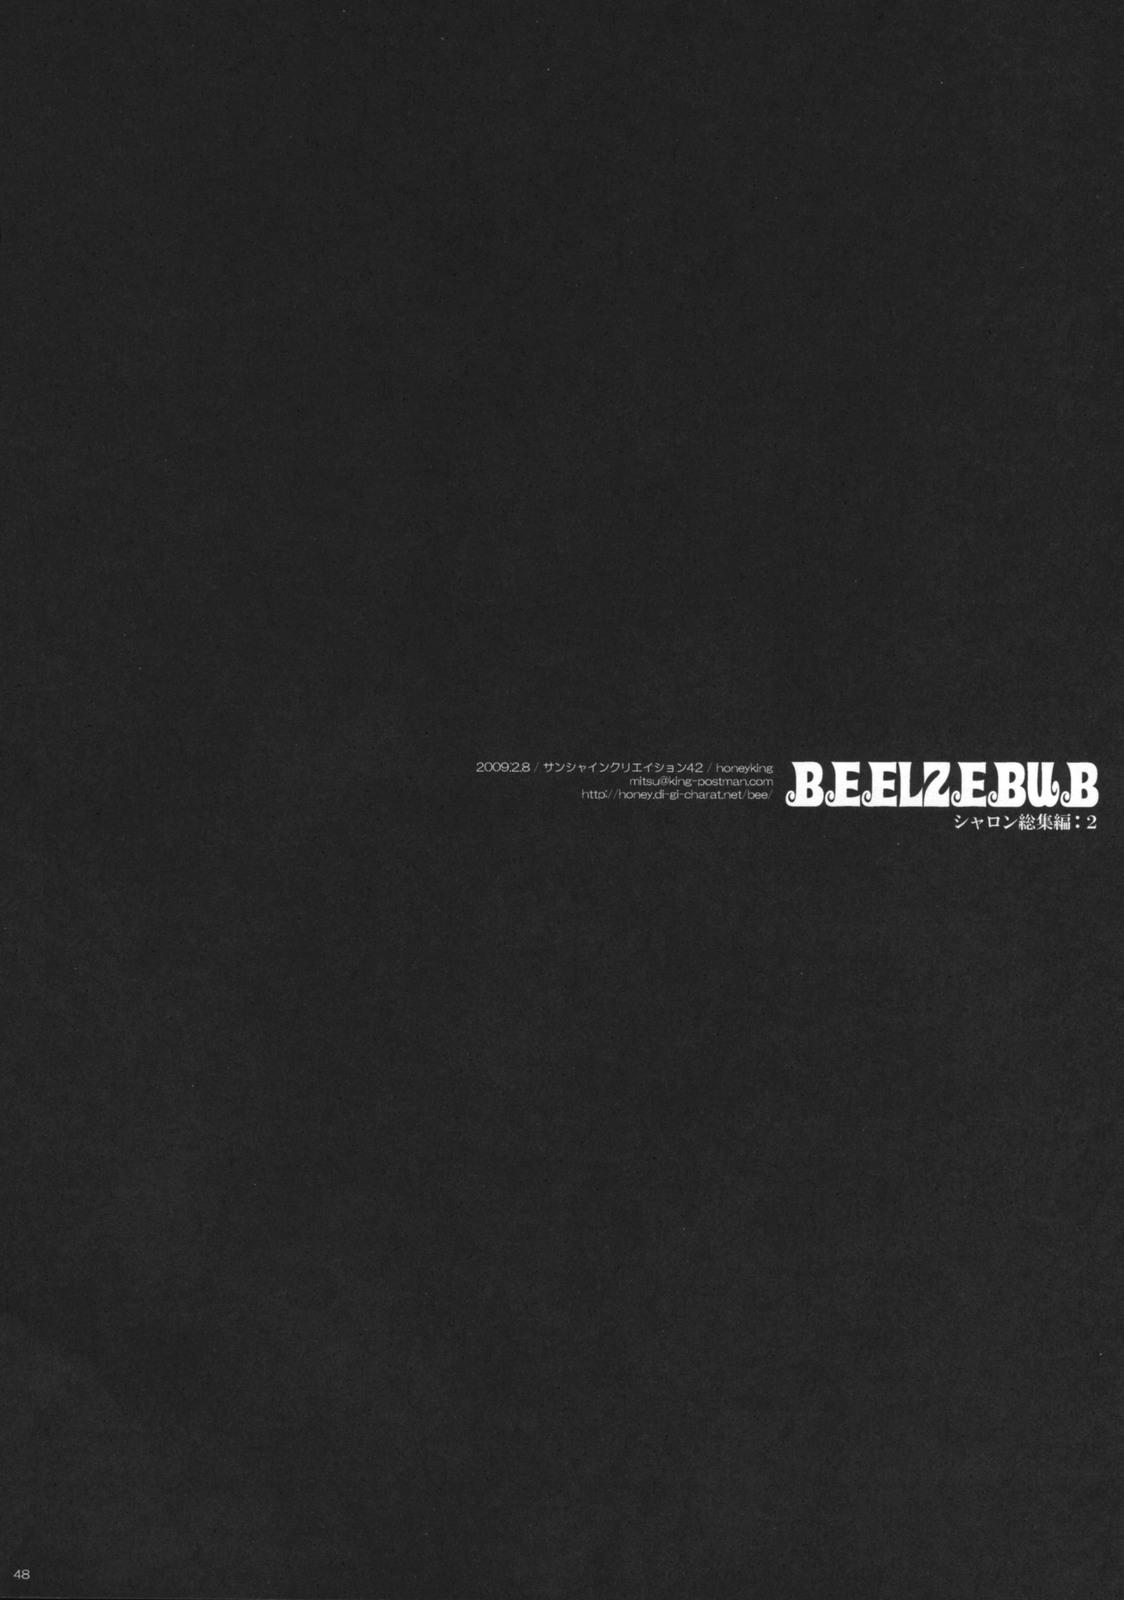 BEELZEBUB 46